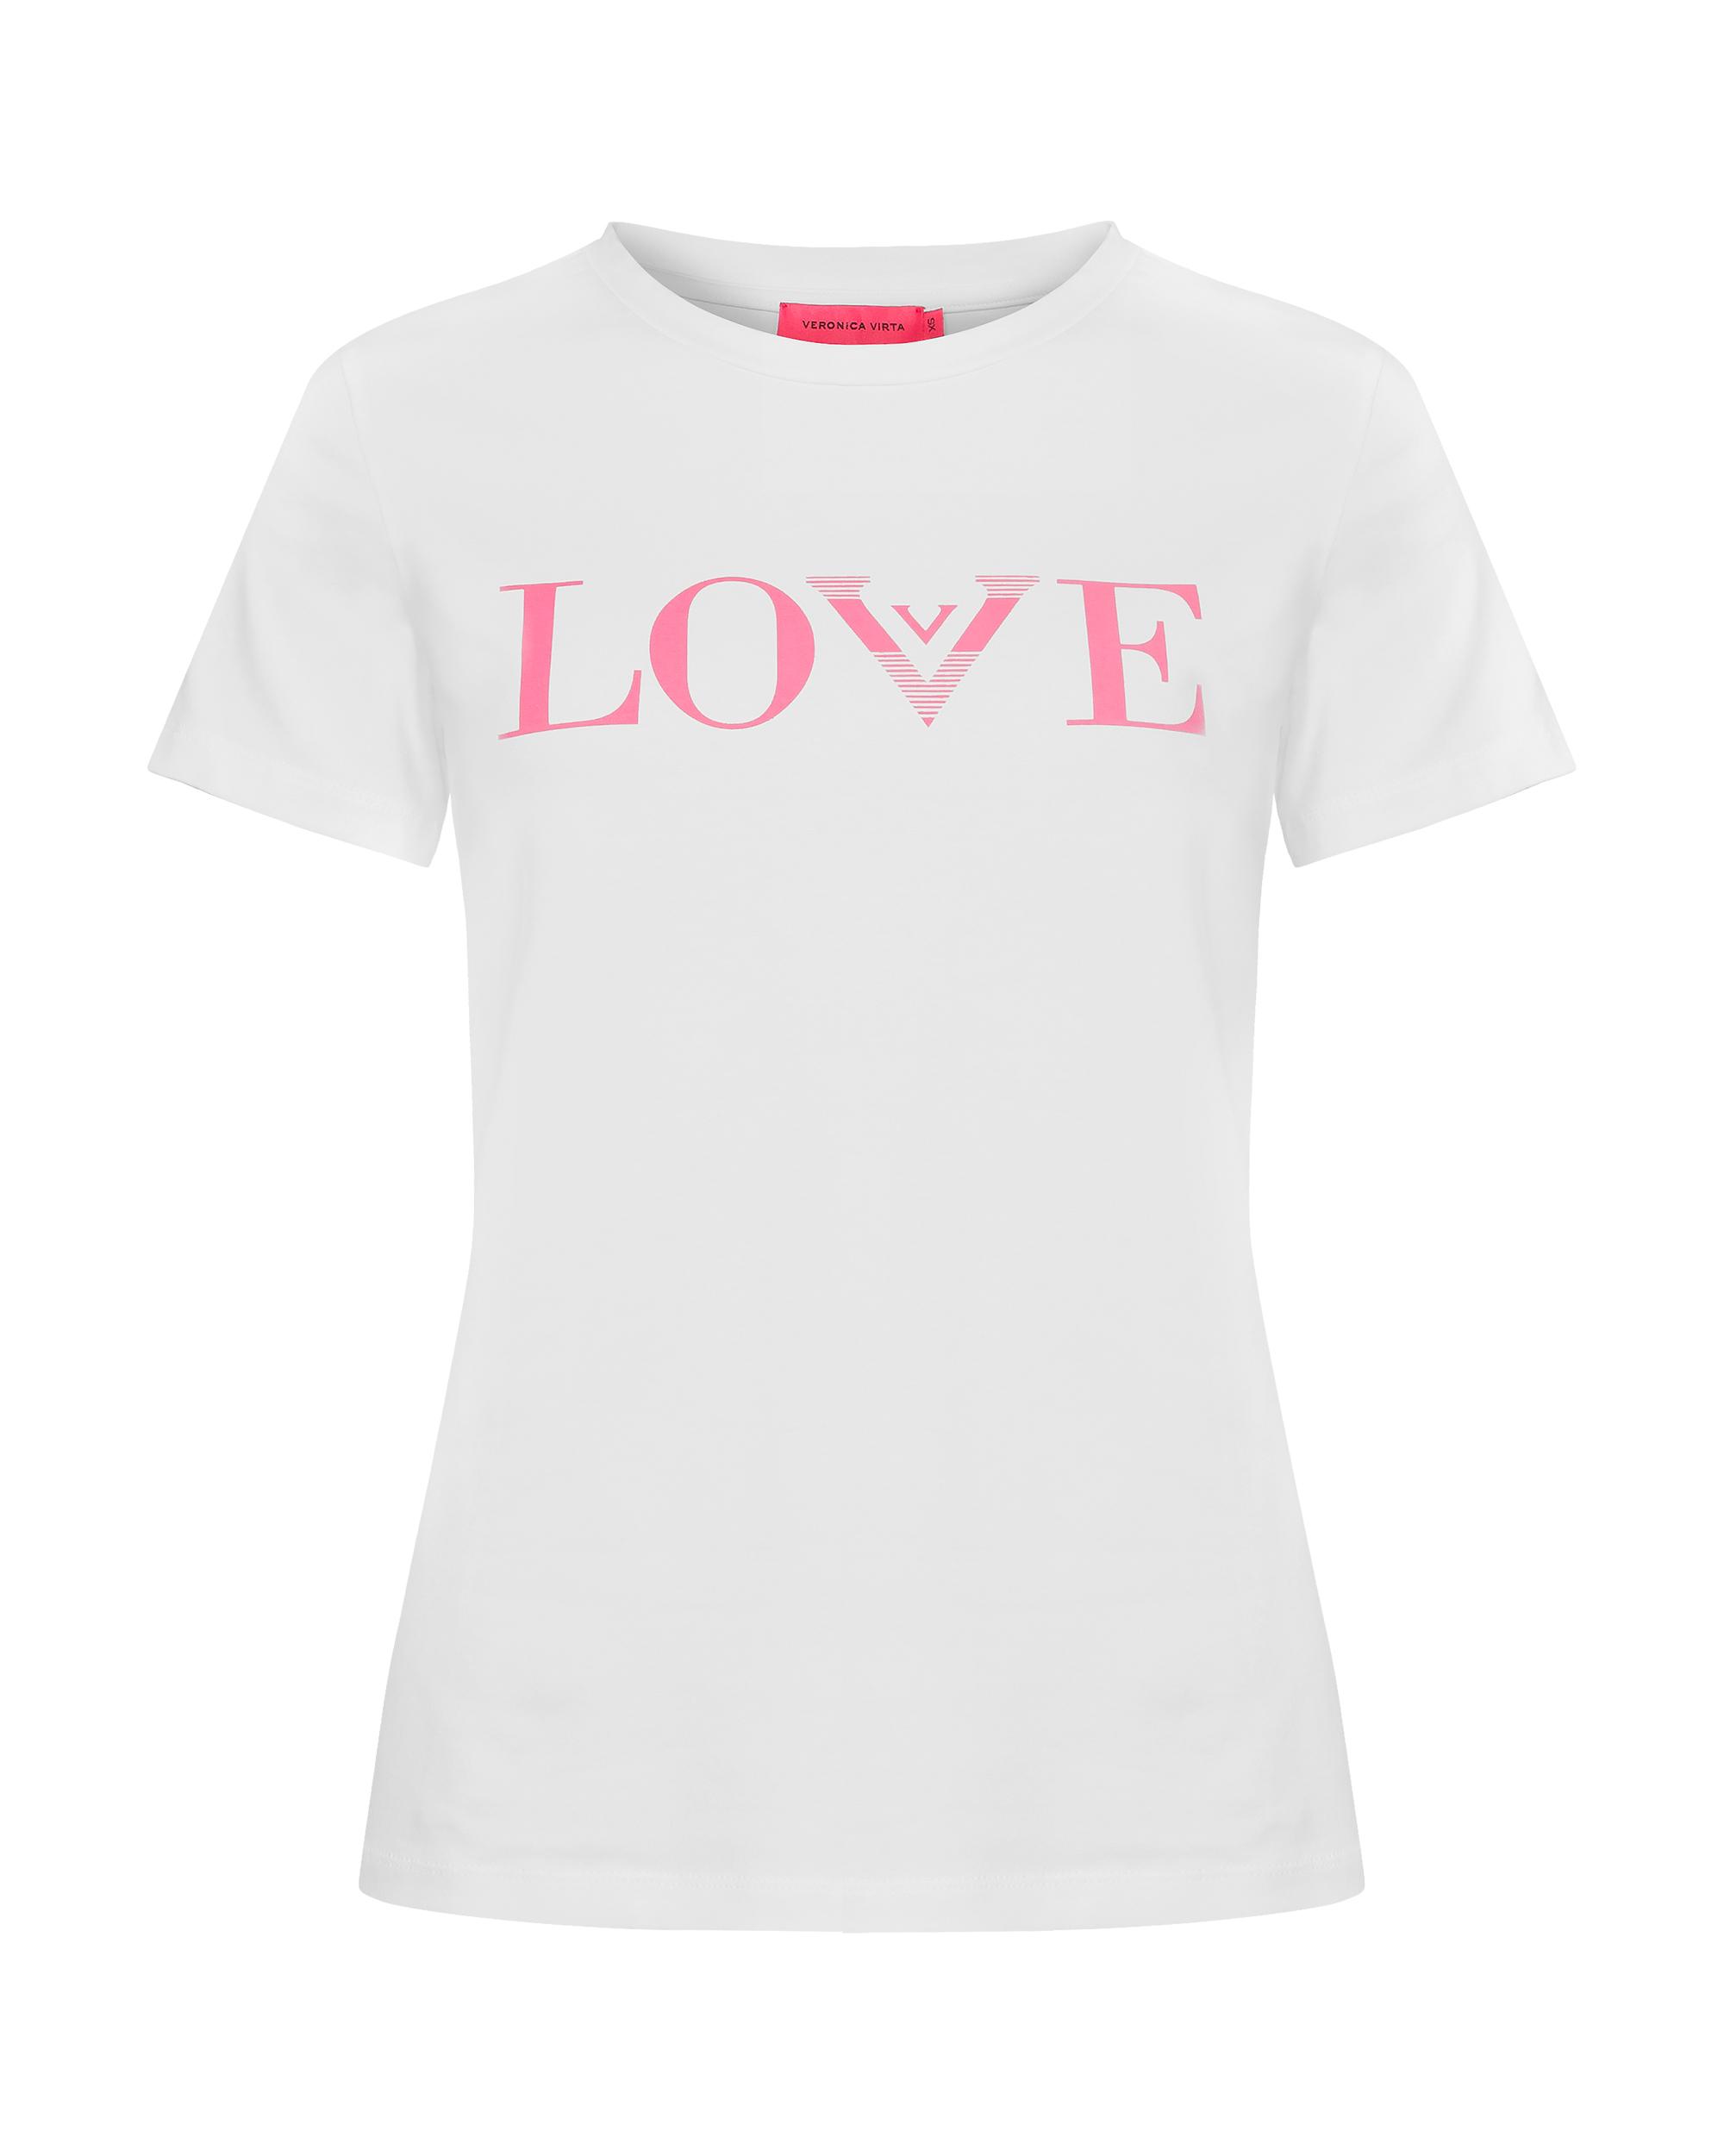 Love_Tee_Pink